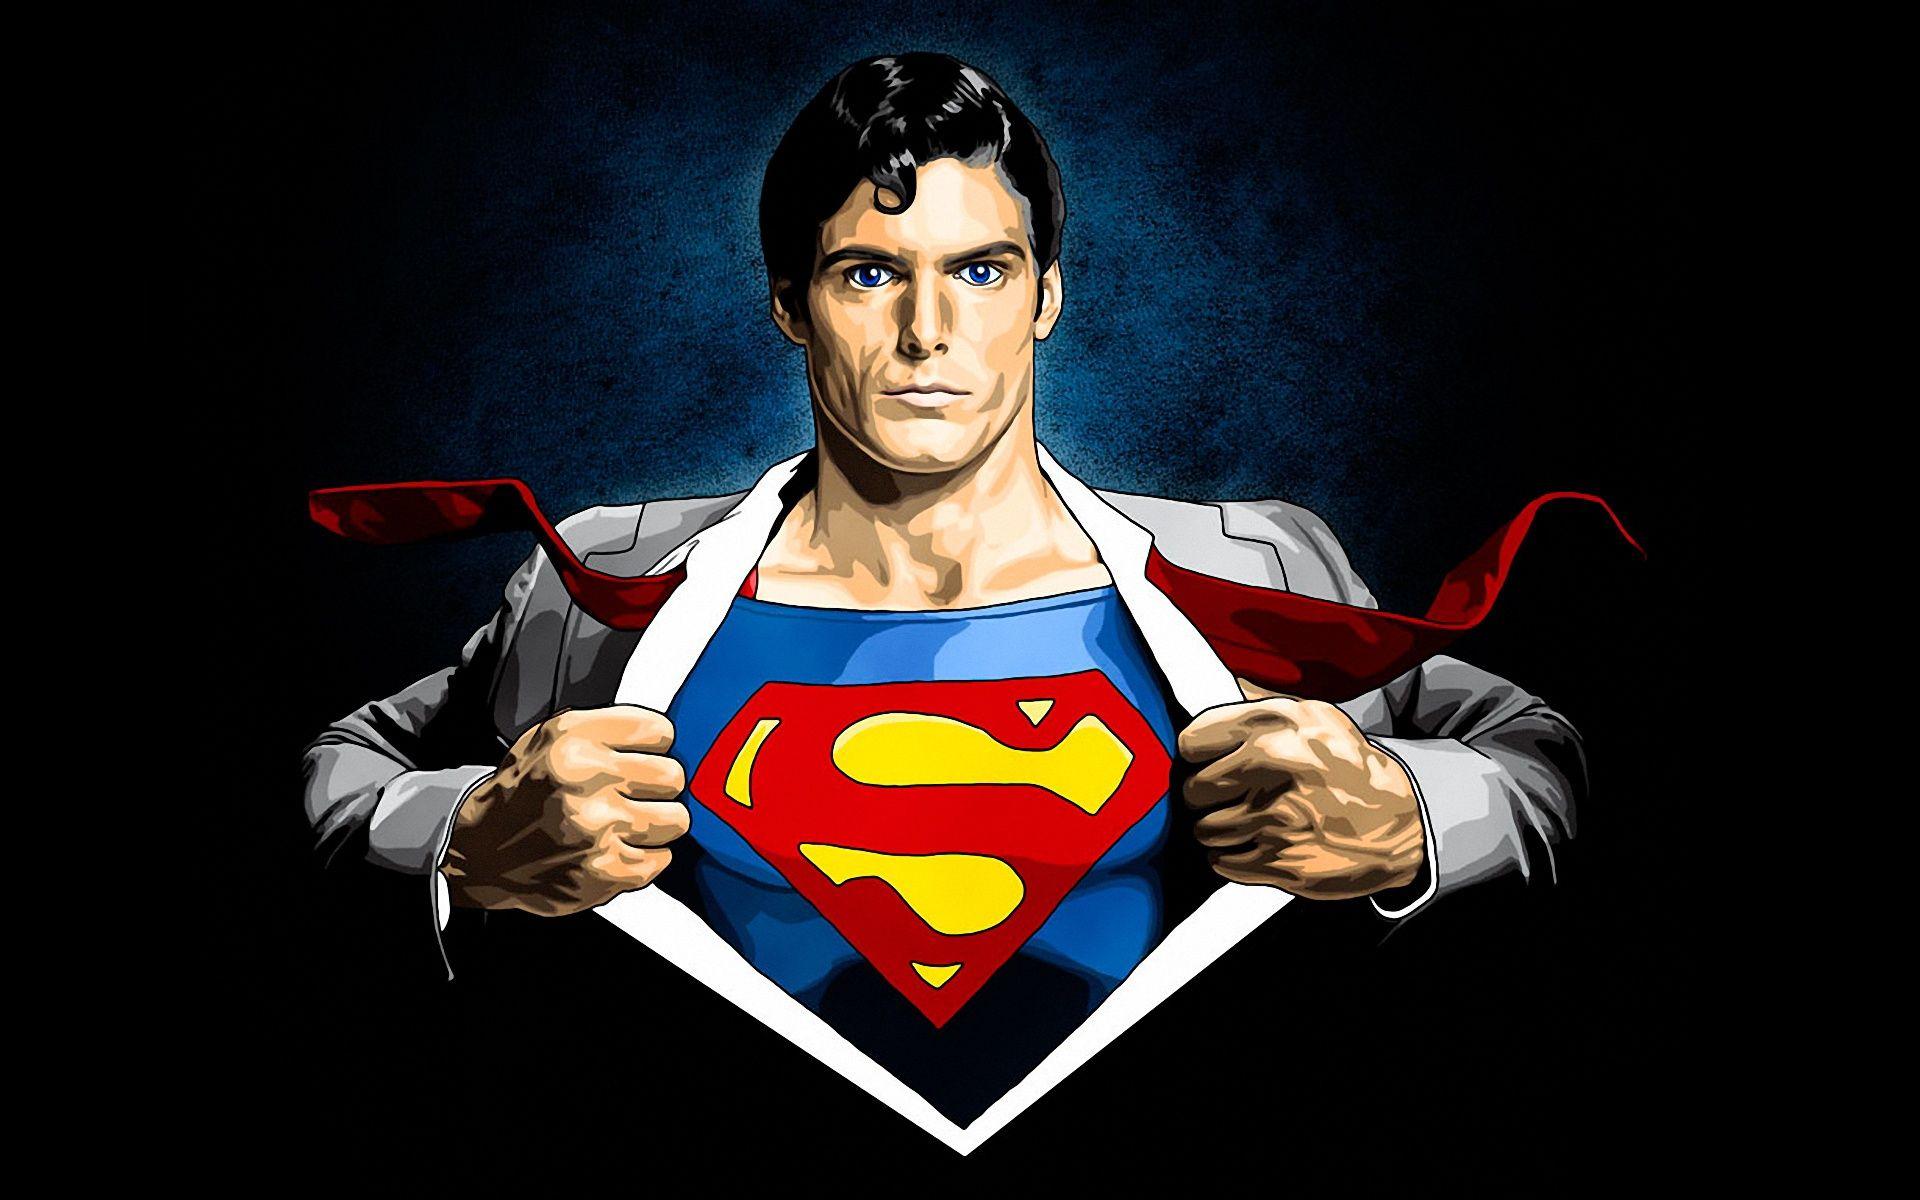 superman chest - Google Search   Superman wallpaper, Superman, Superman logo